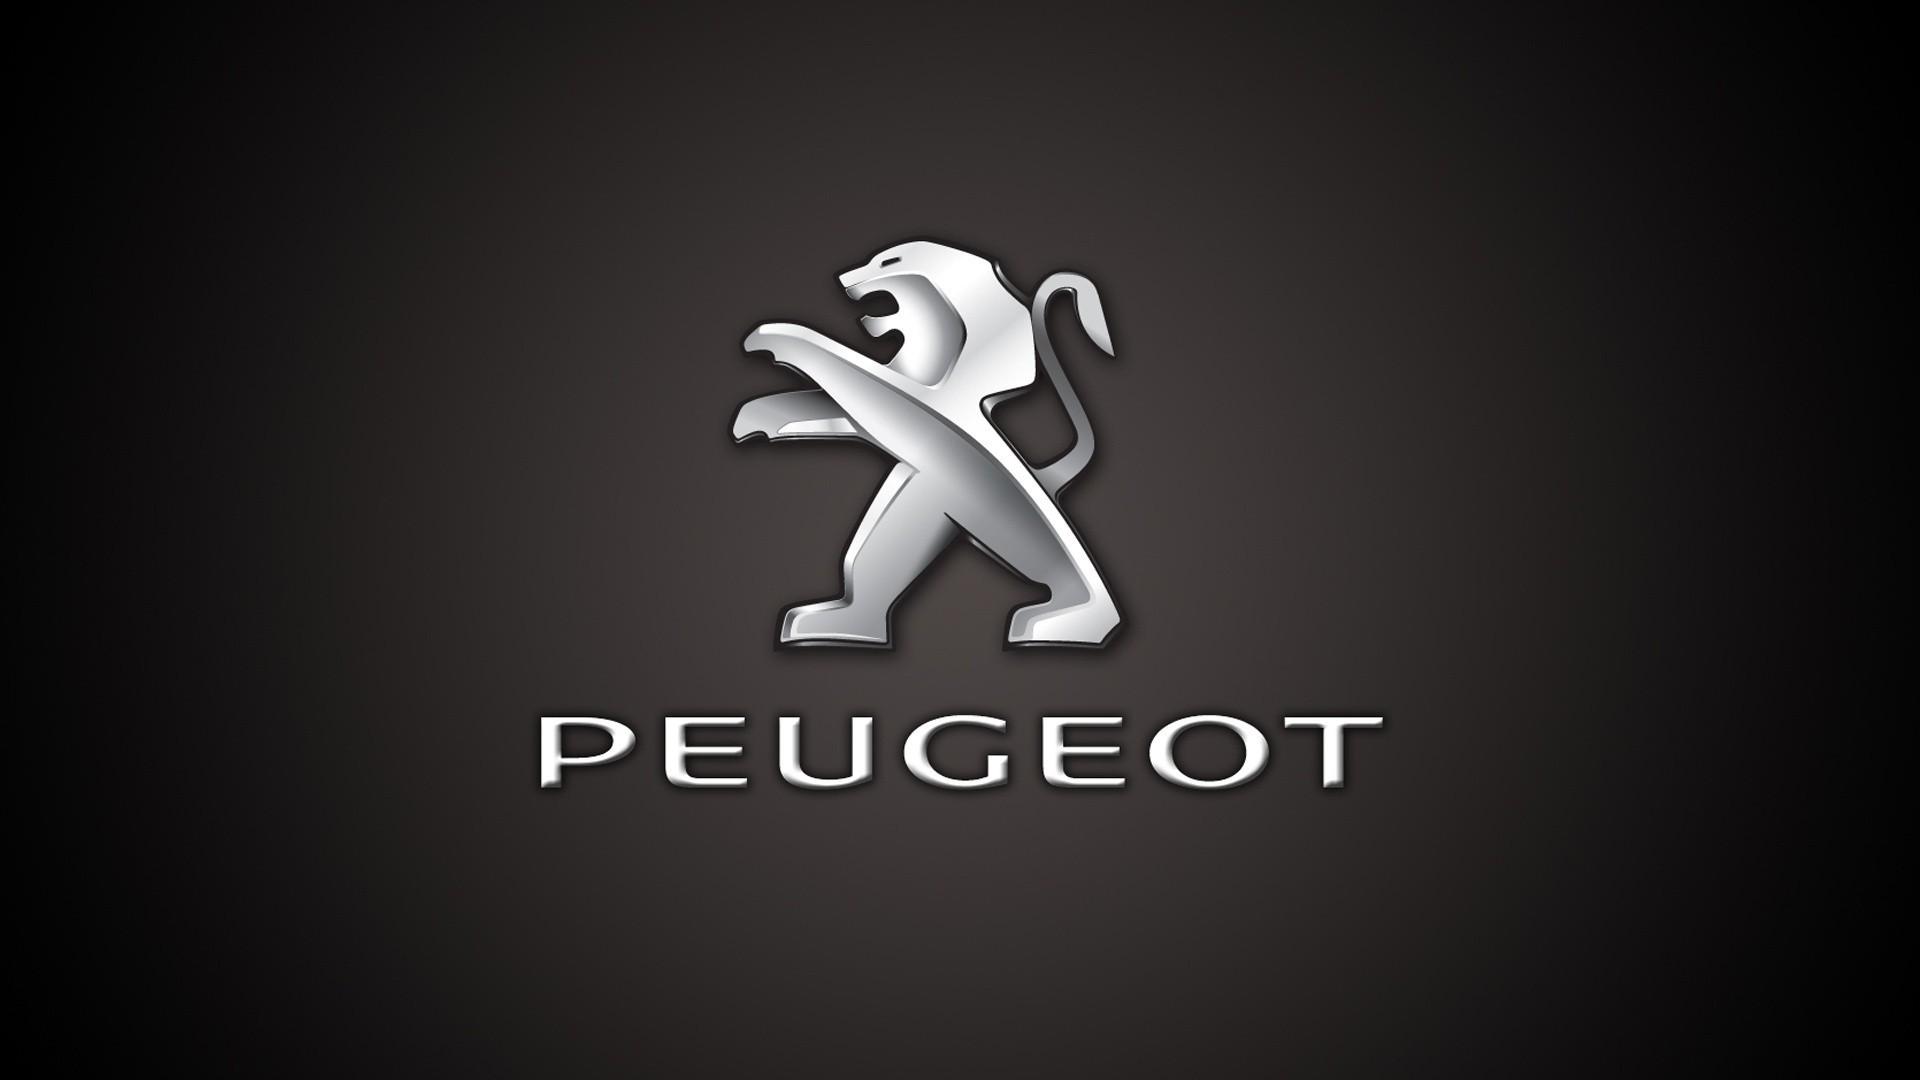 Elegant Peugeot Steel Lion Logo Wallpaper Hd Cars